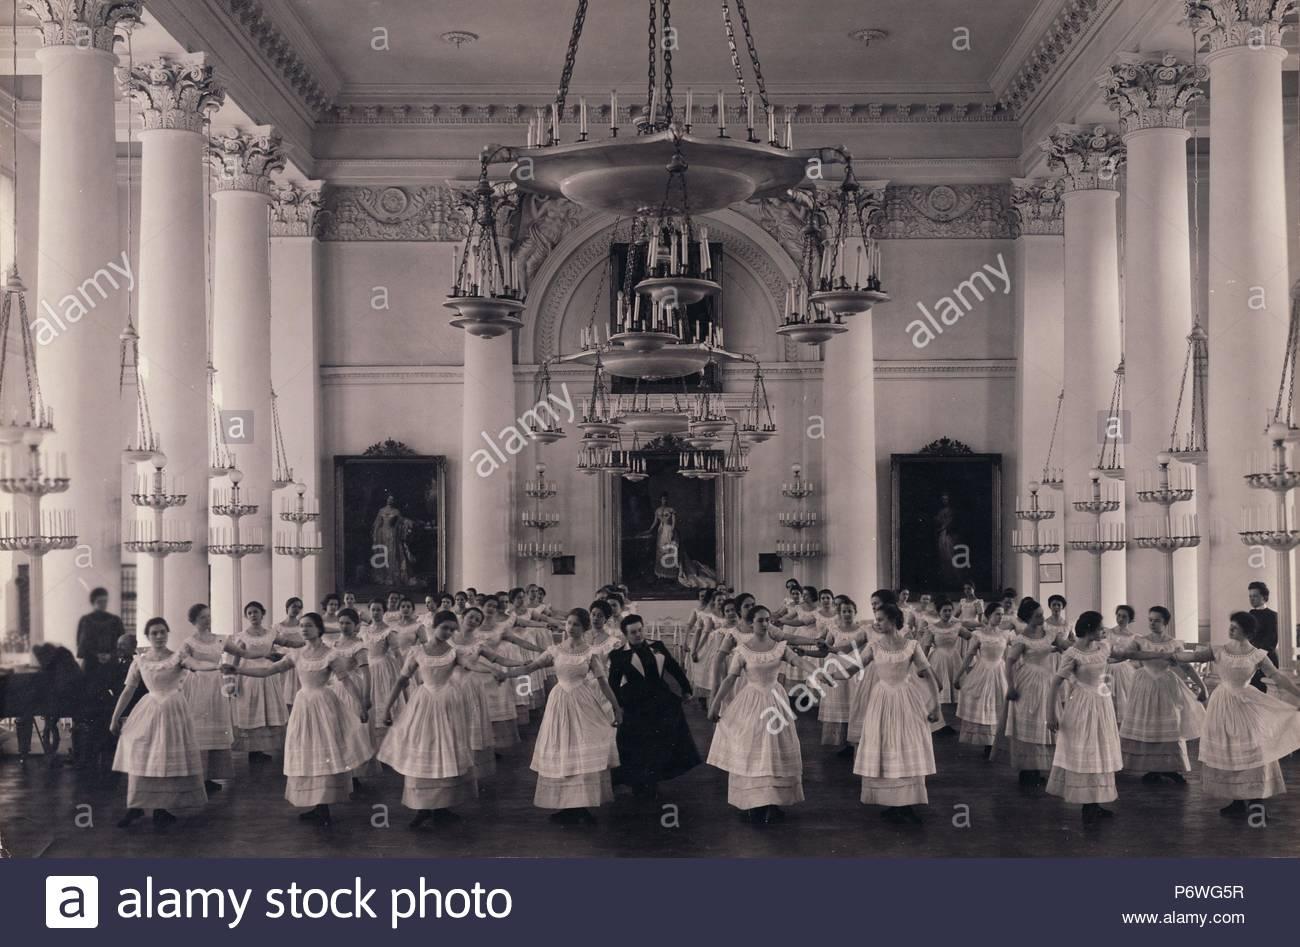 Dancing Lesson, the 'Mazurka'.; Karl Karlovitz Bulla, Russian, 1854 - 1929; before 1917; Gelatin silver print; Image: 18.4 x 27.9 cm (7 1/4 x 11 in.). - Stock Image